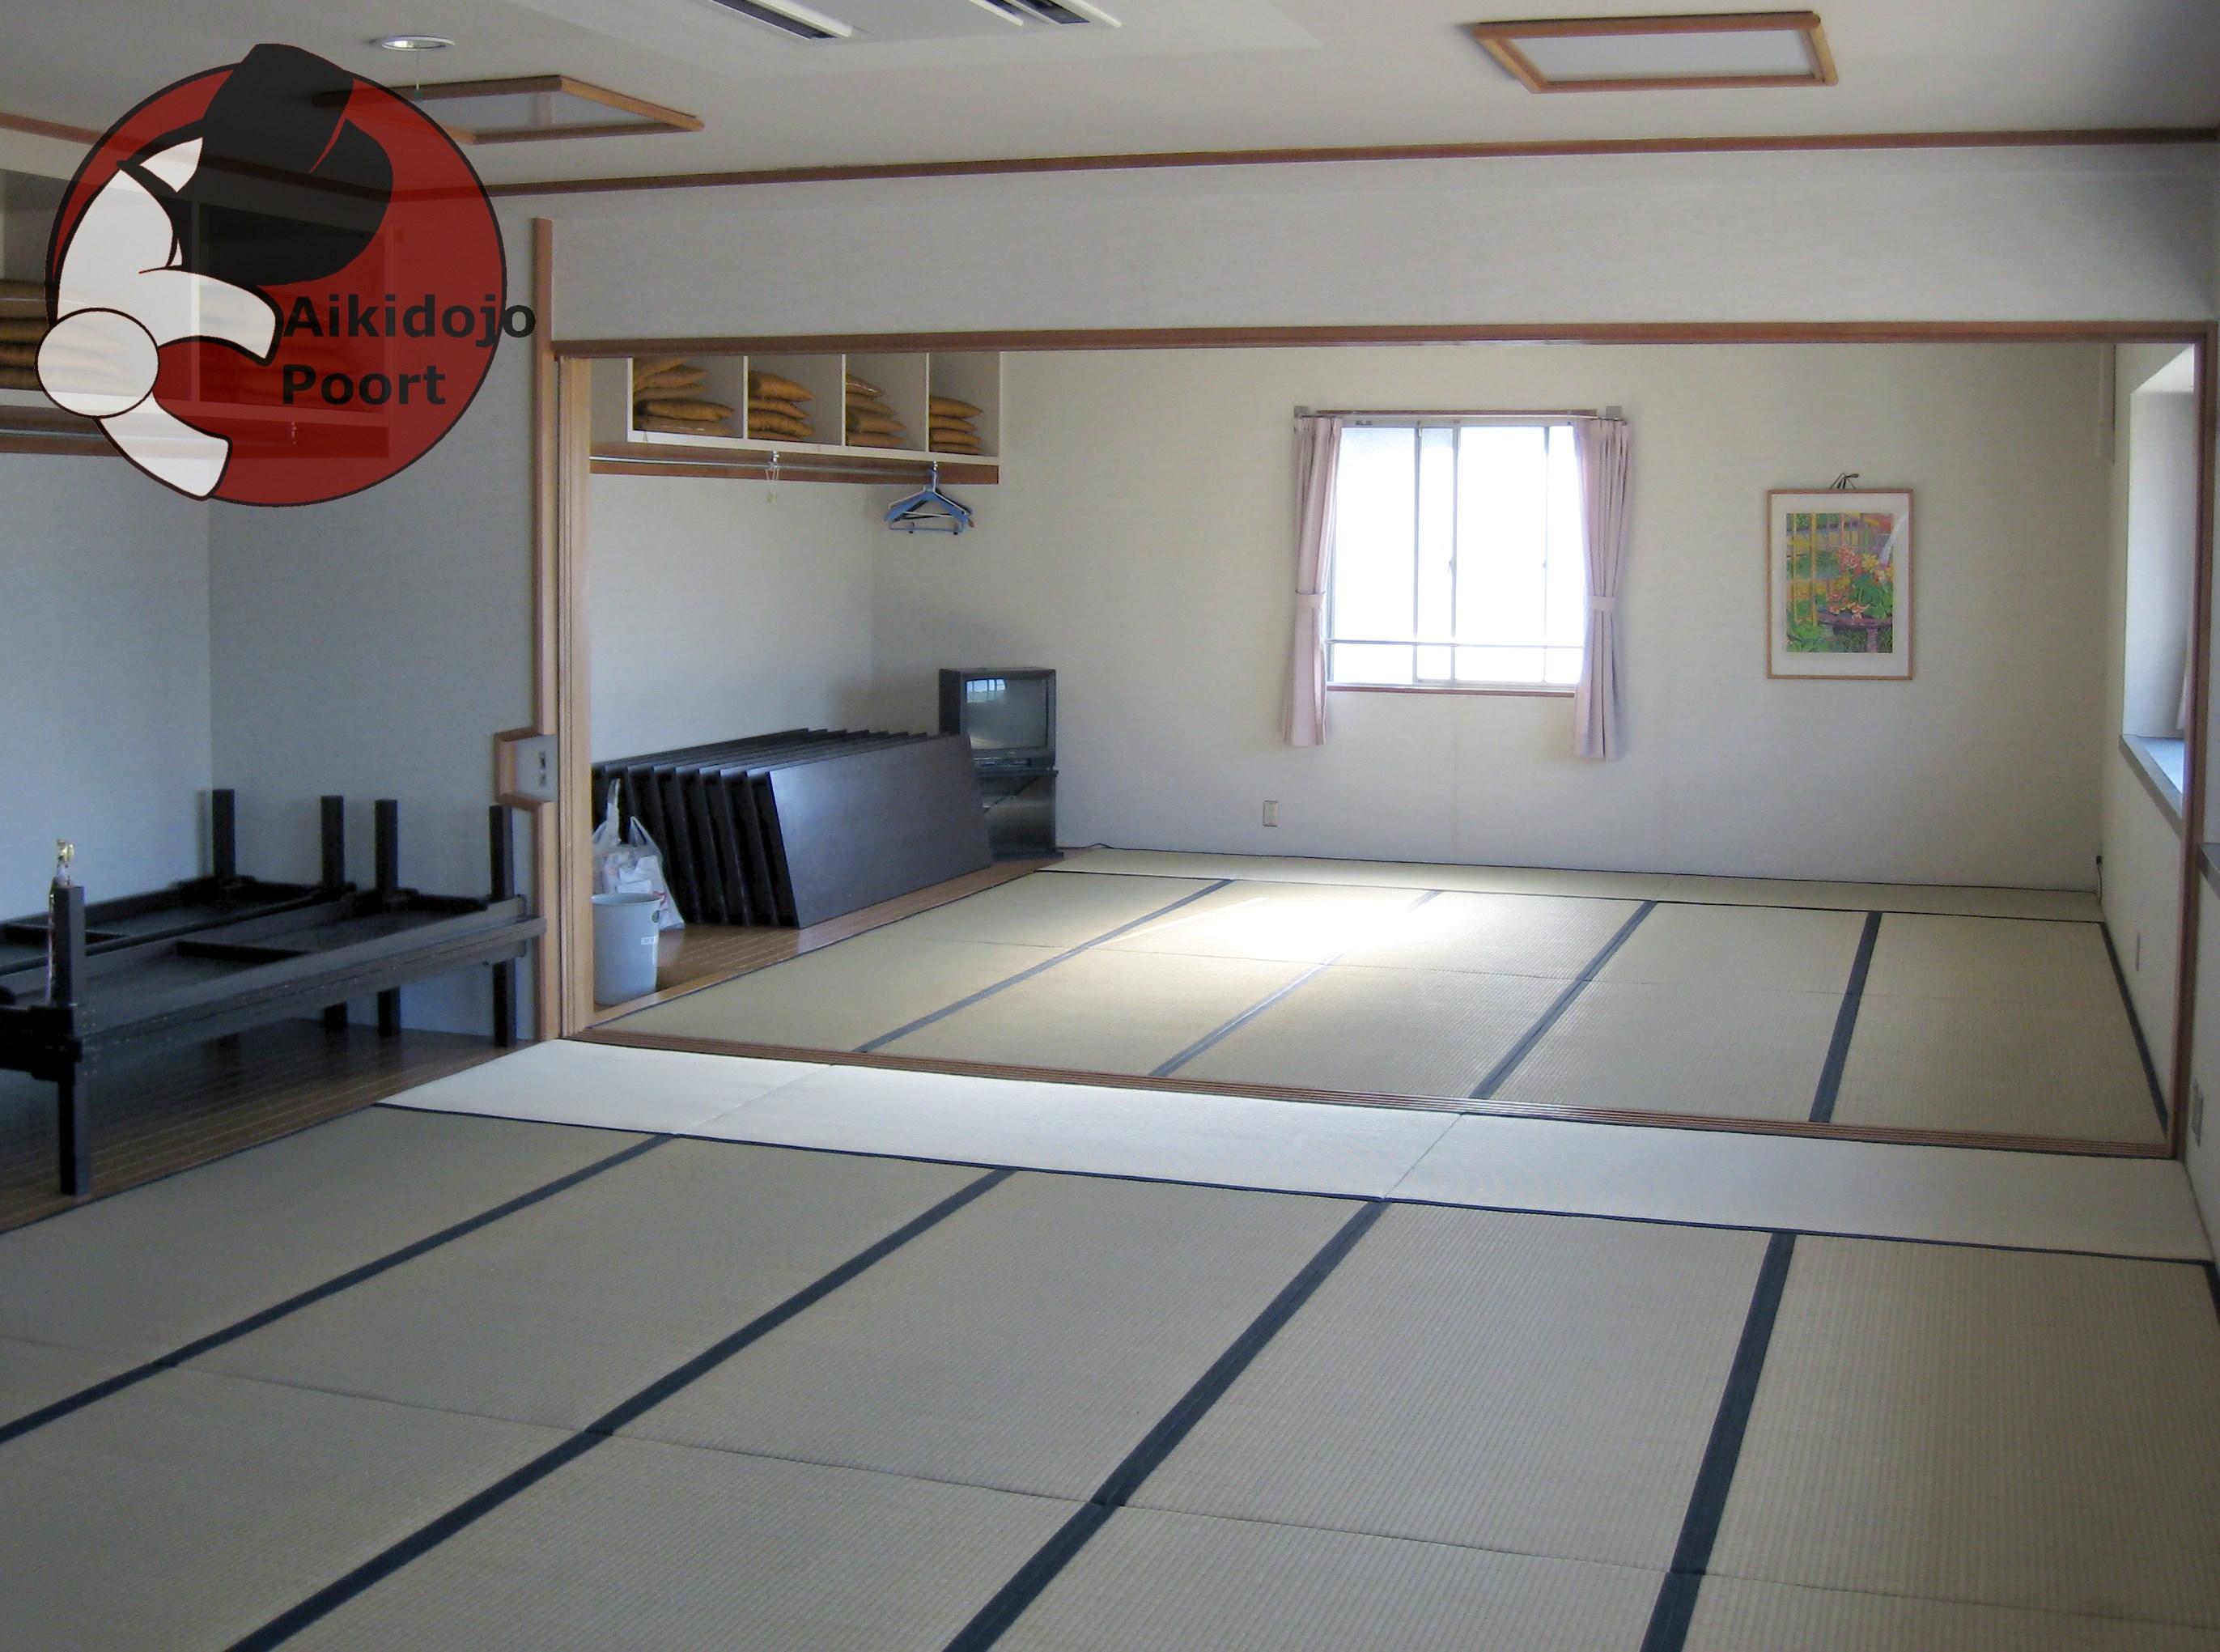 Tatami aikidojo poort - Japanse stijl kamer ...